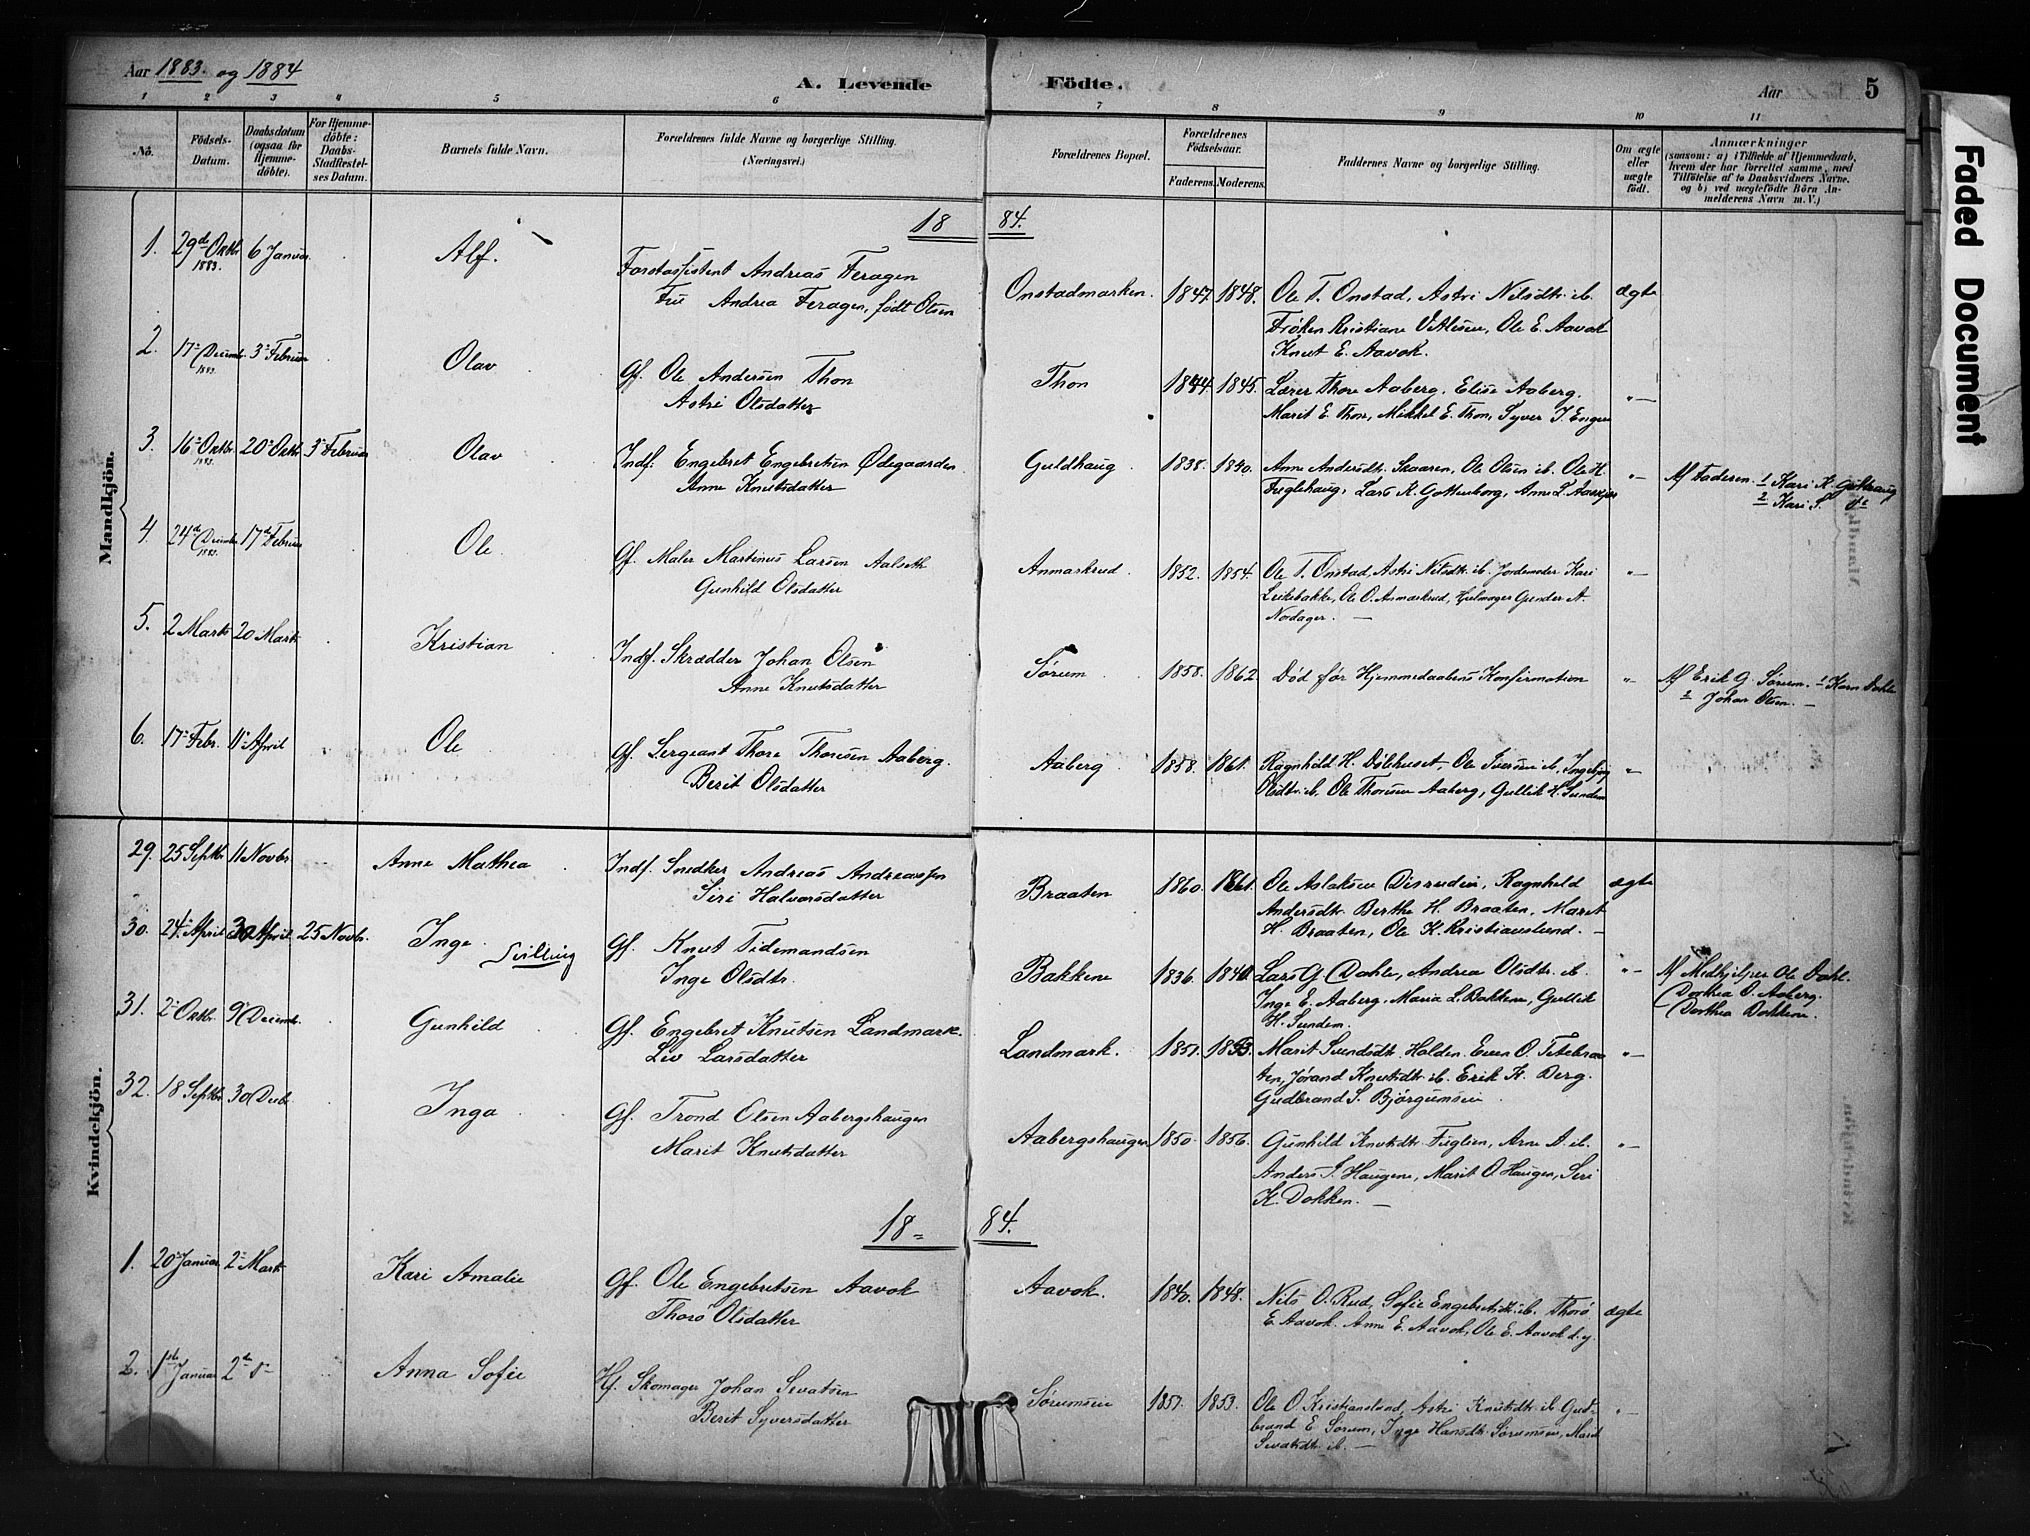 SAH, Nord-Aurdal prestekontor, Ministerialbok nr. 13, 1883-1895, s. 5